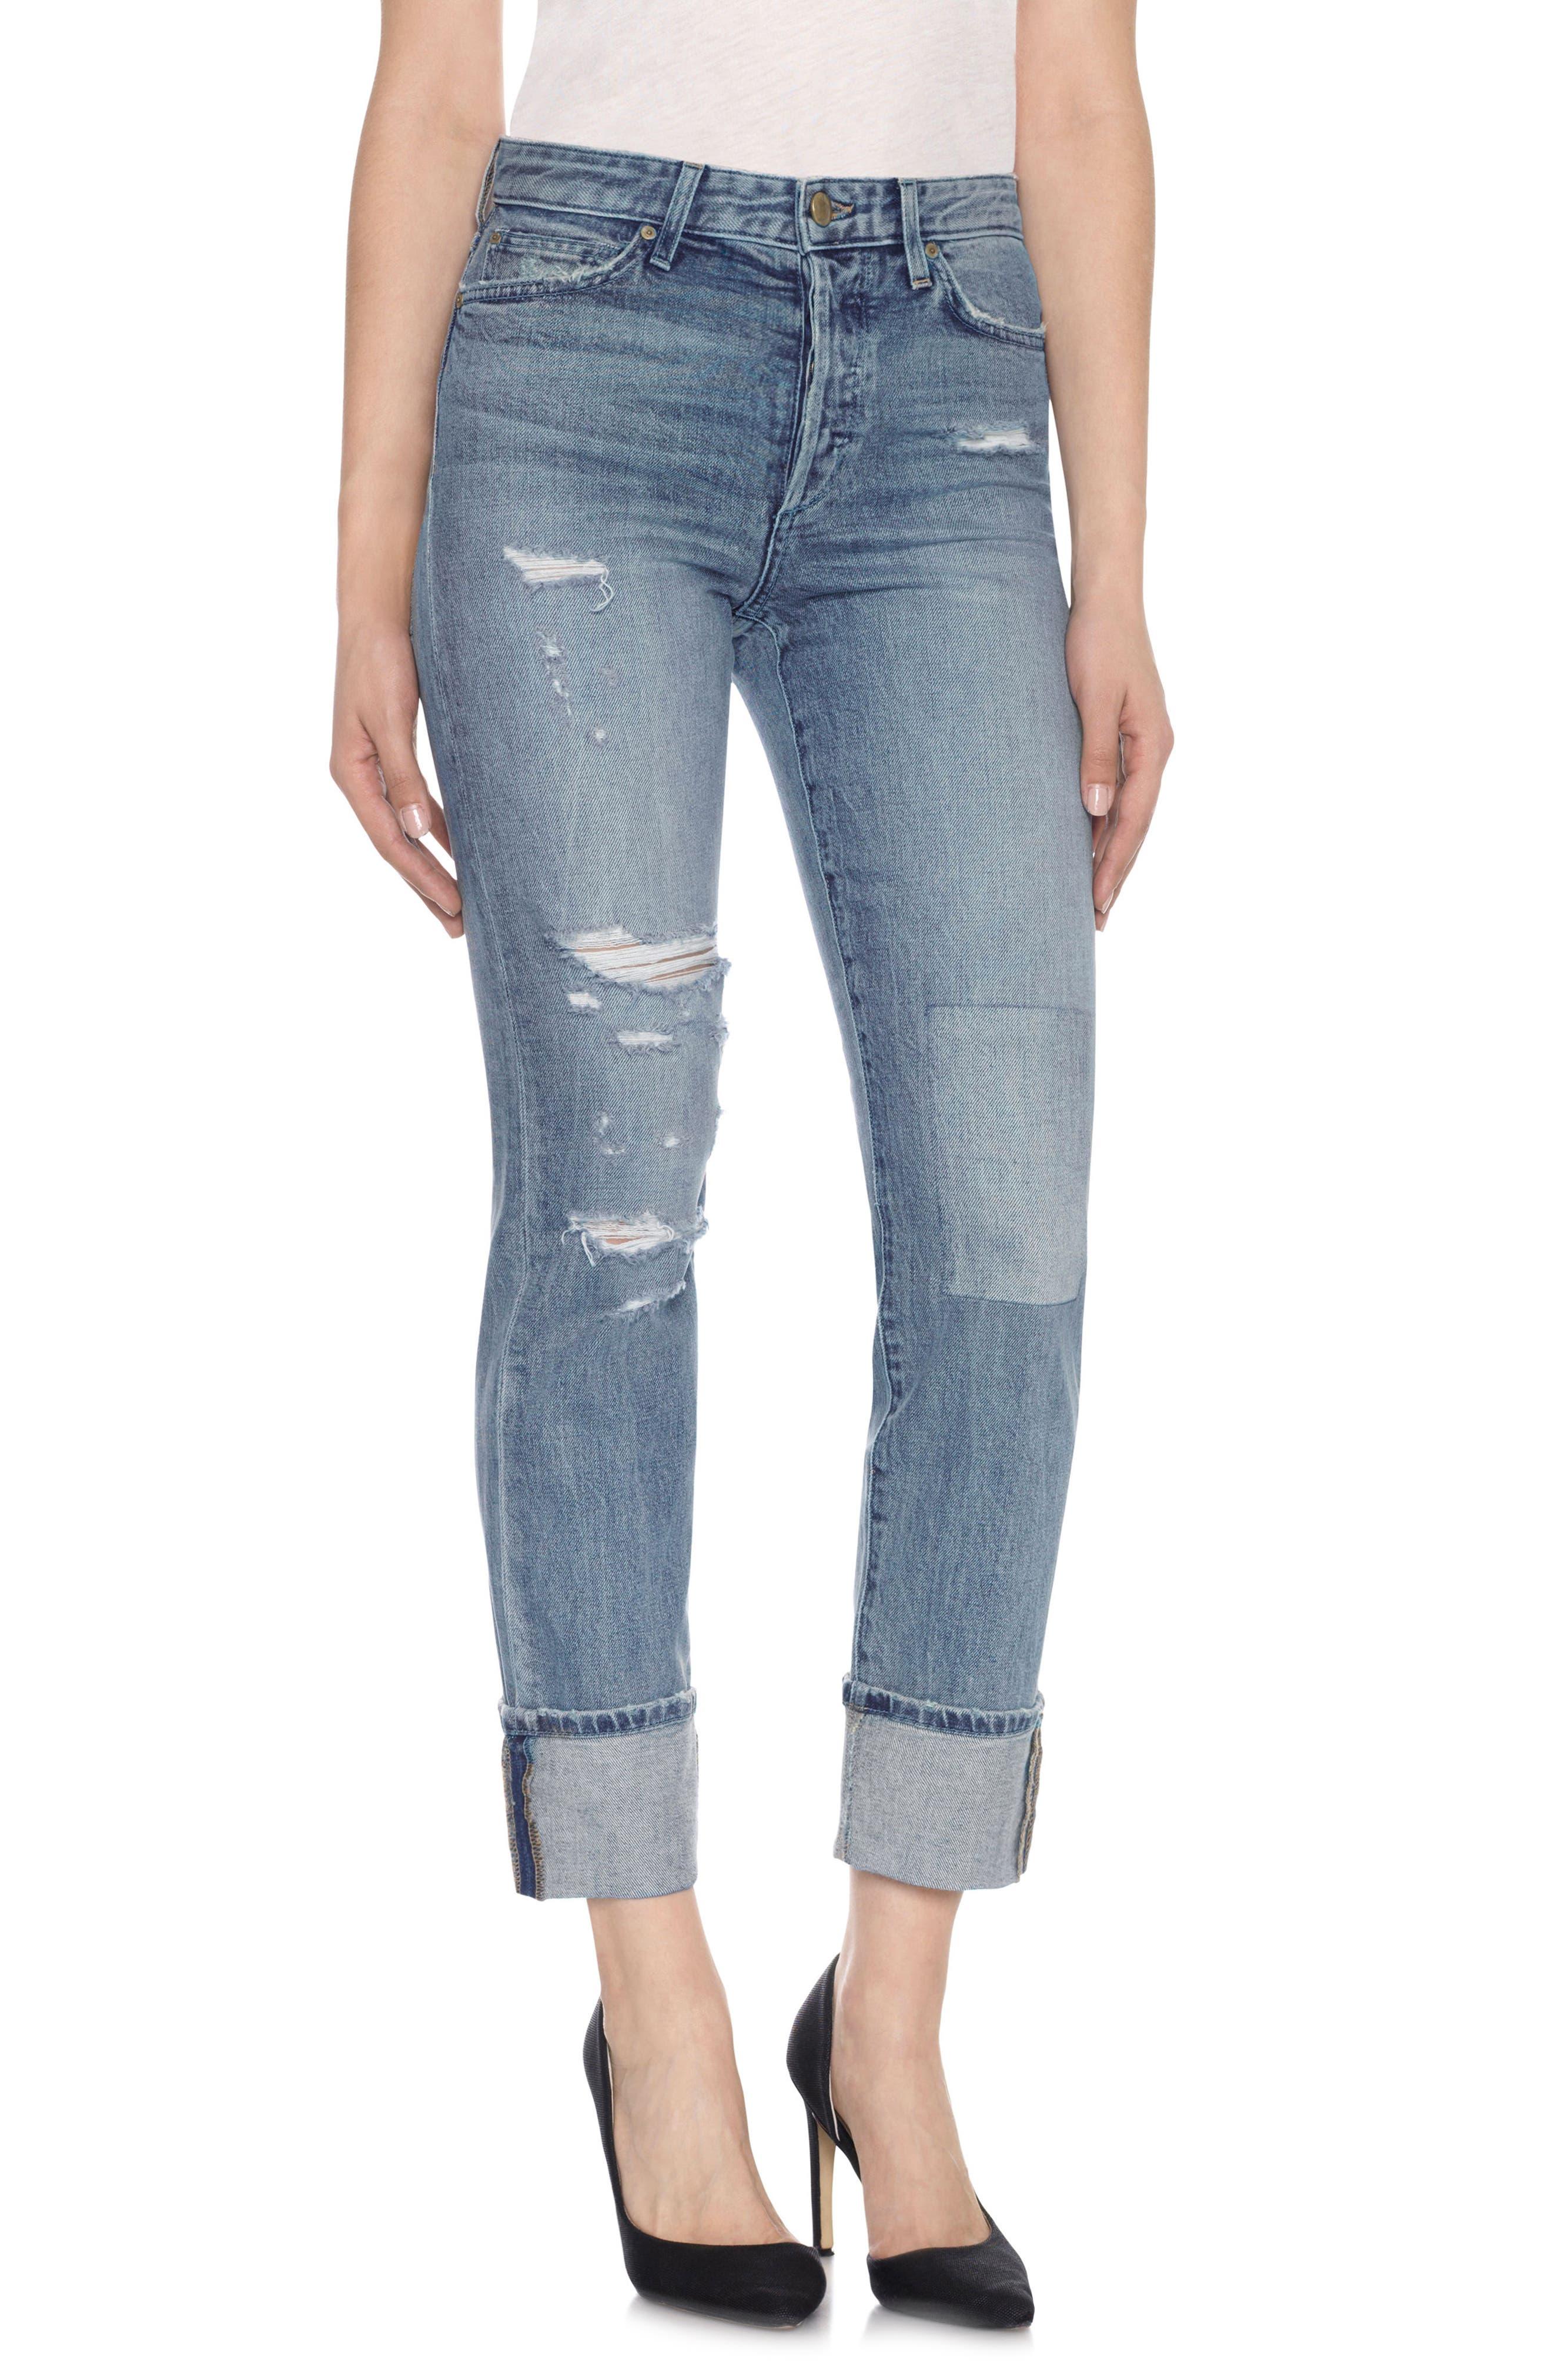 Taylor Hill x Joe's Debbie Cuff Straight Leg Jeans,                             Main thumbnail 1, color,                             430